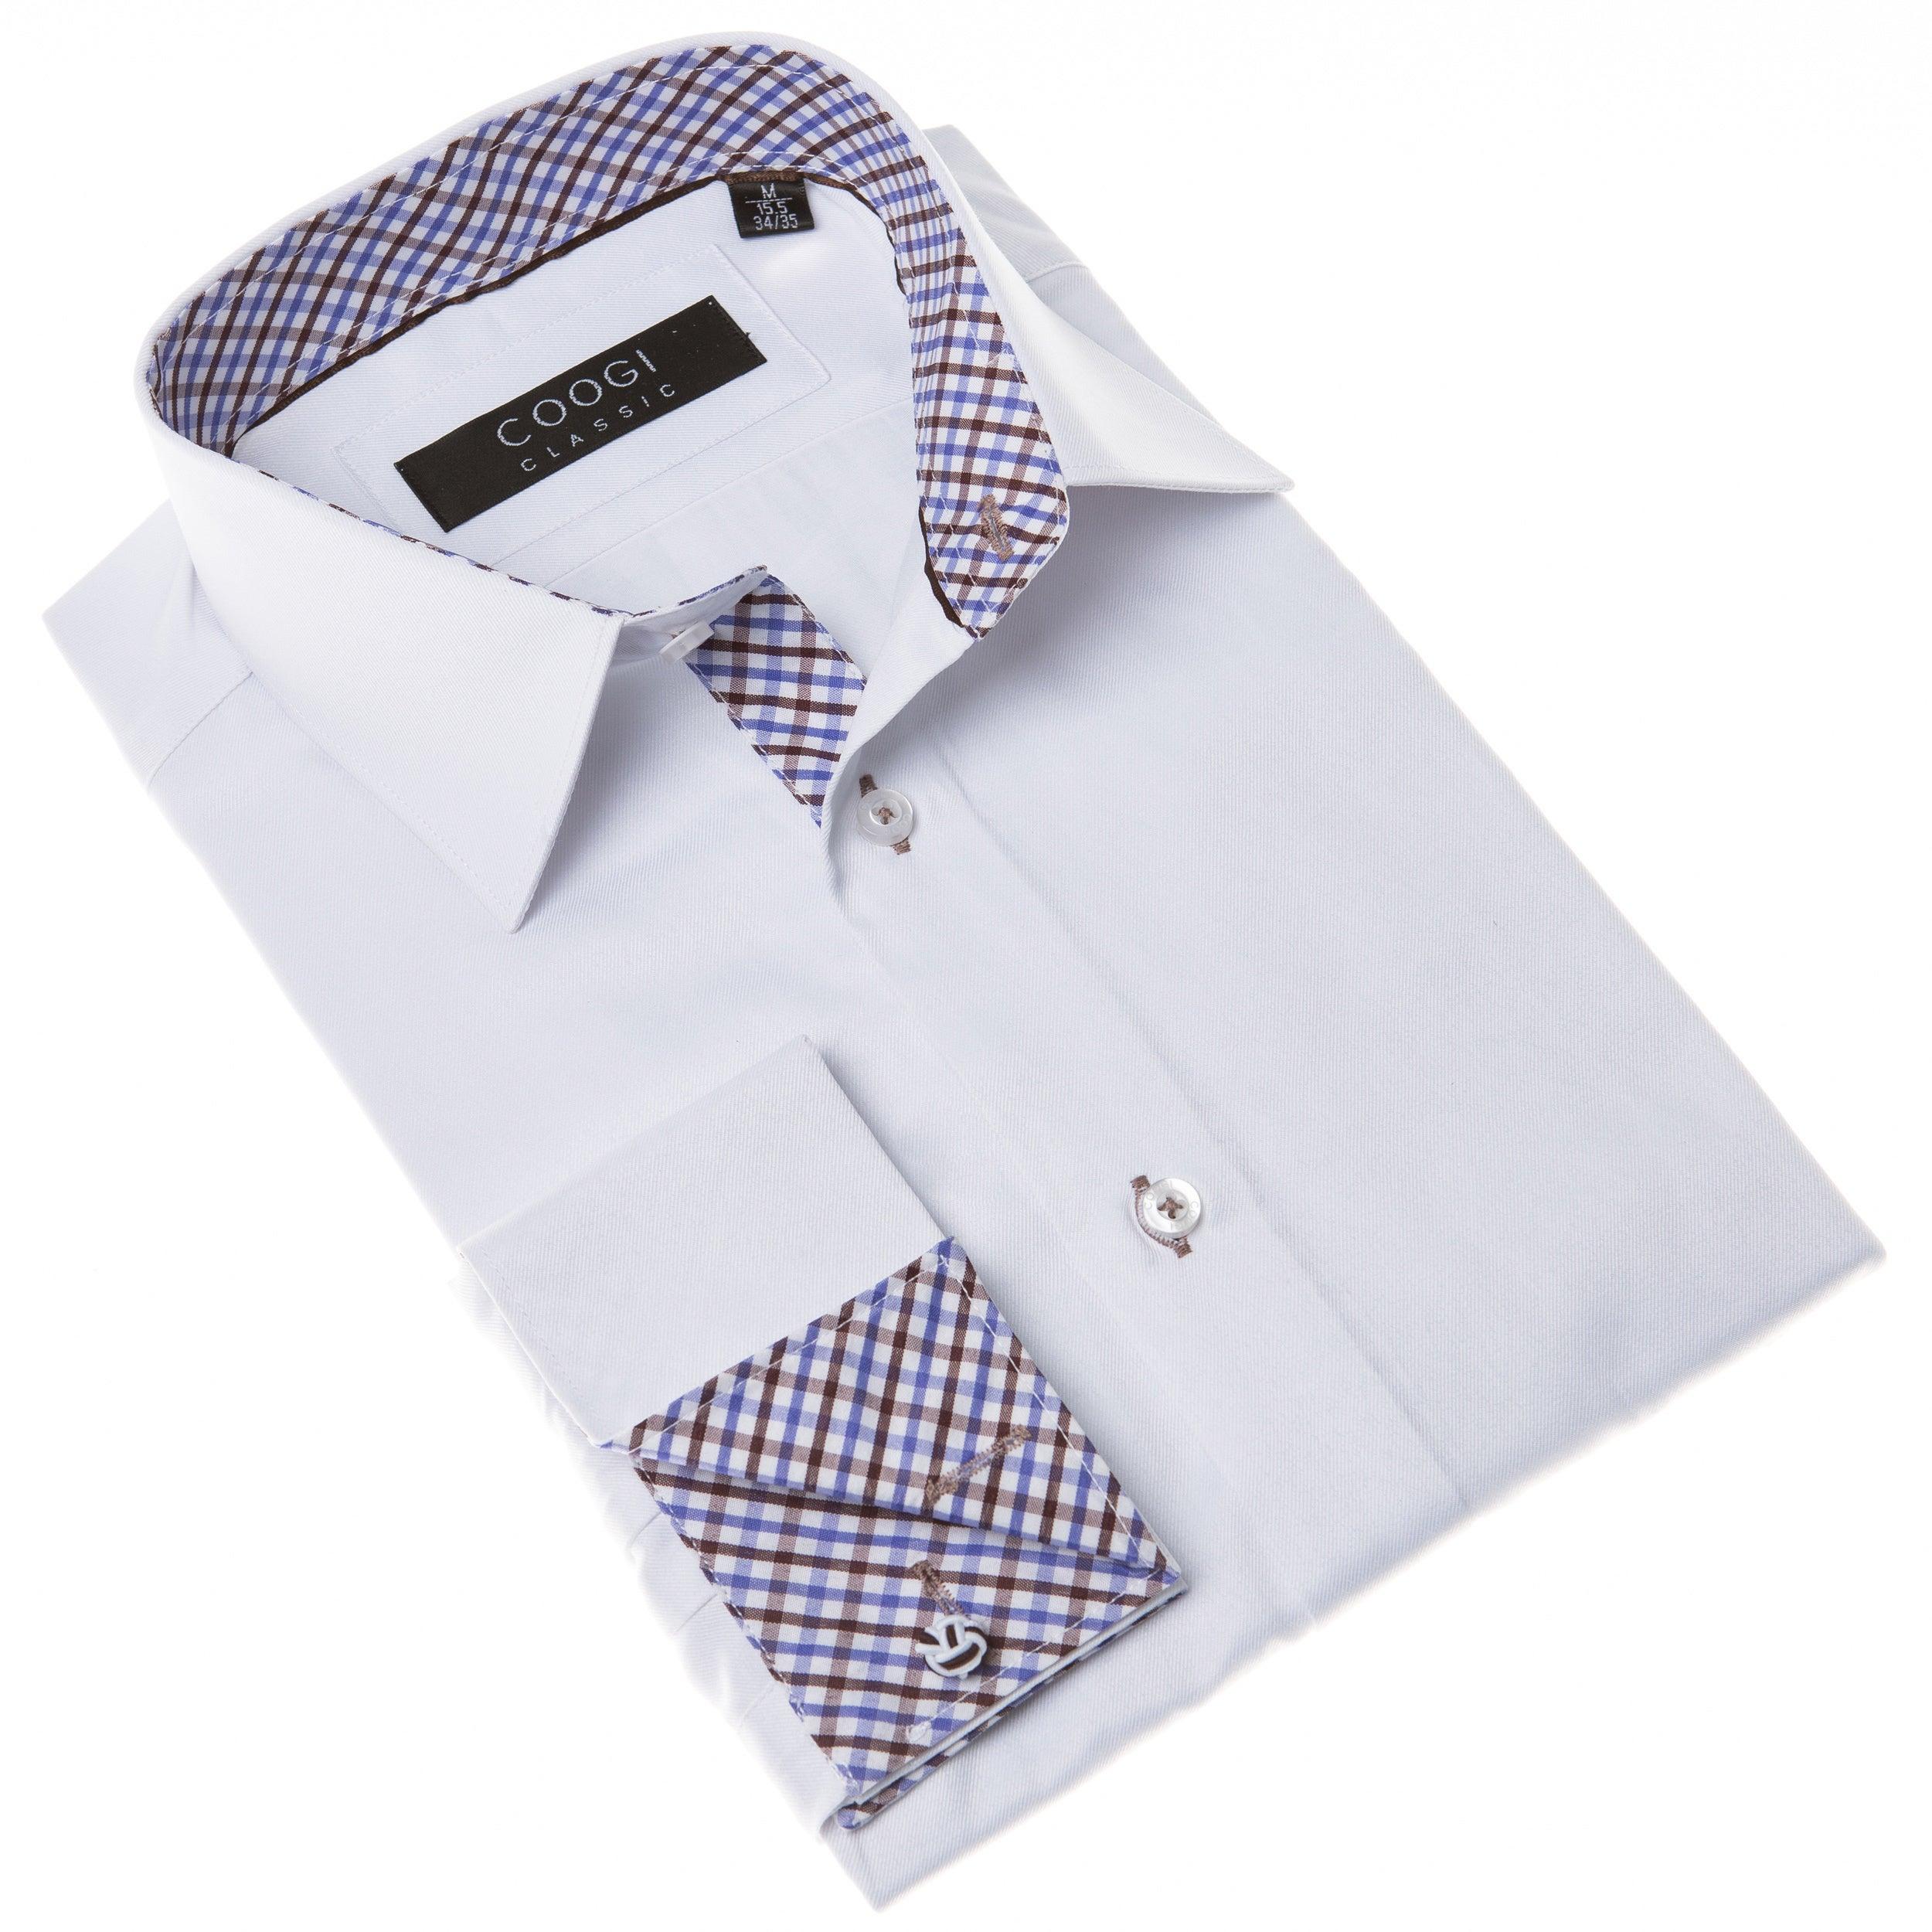 BRIO Coogi Men's White Dress Shirt with Blue and Brown Gi...